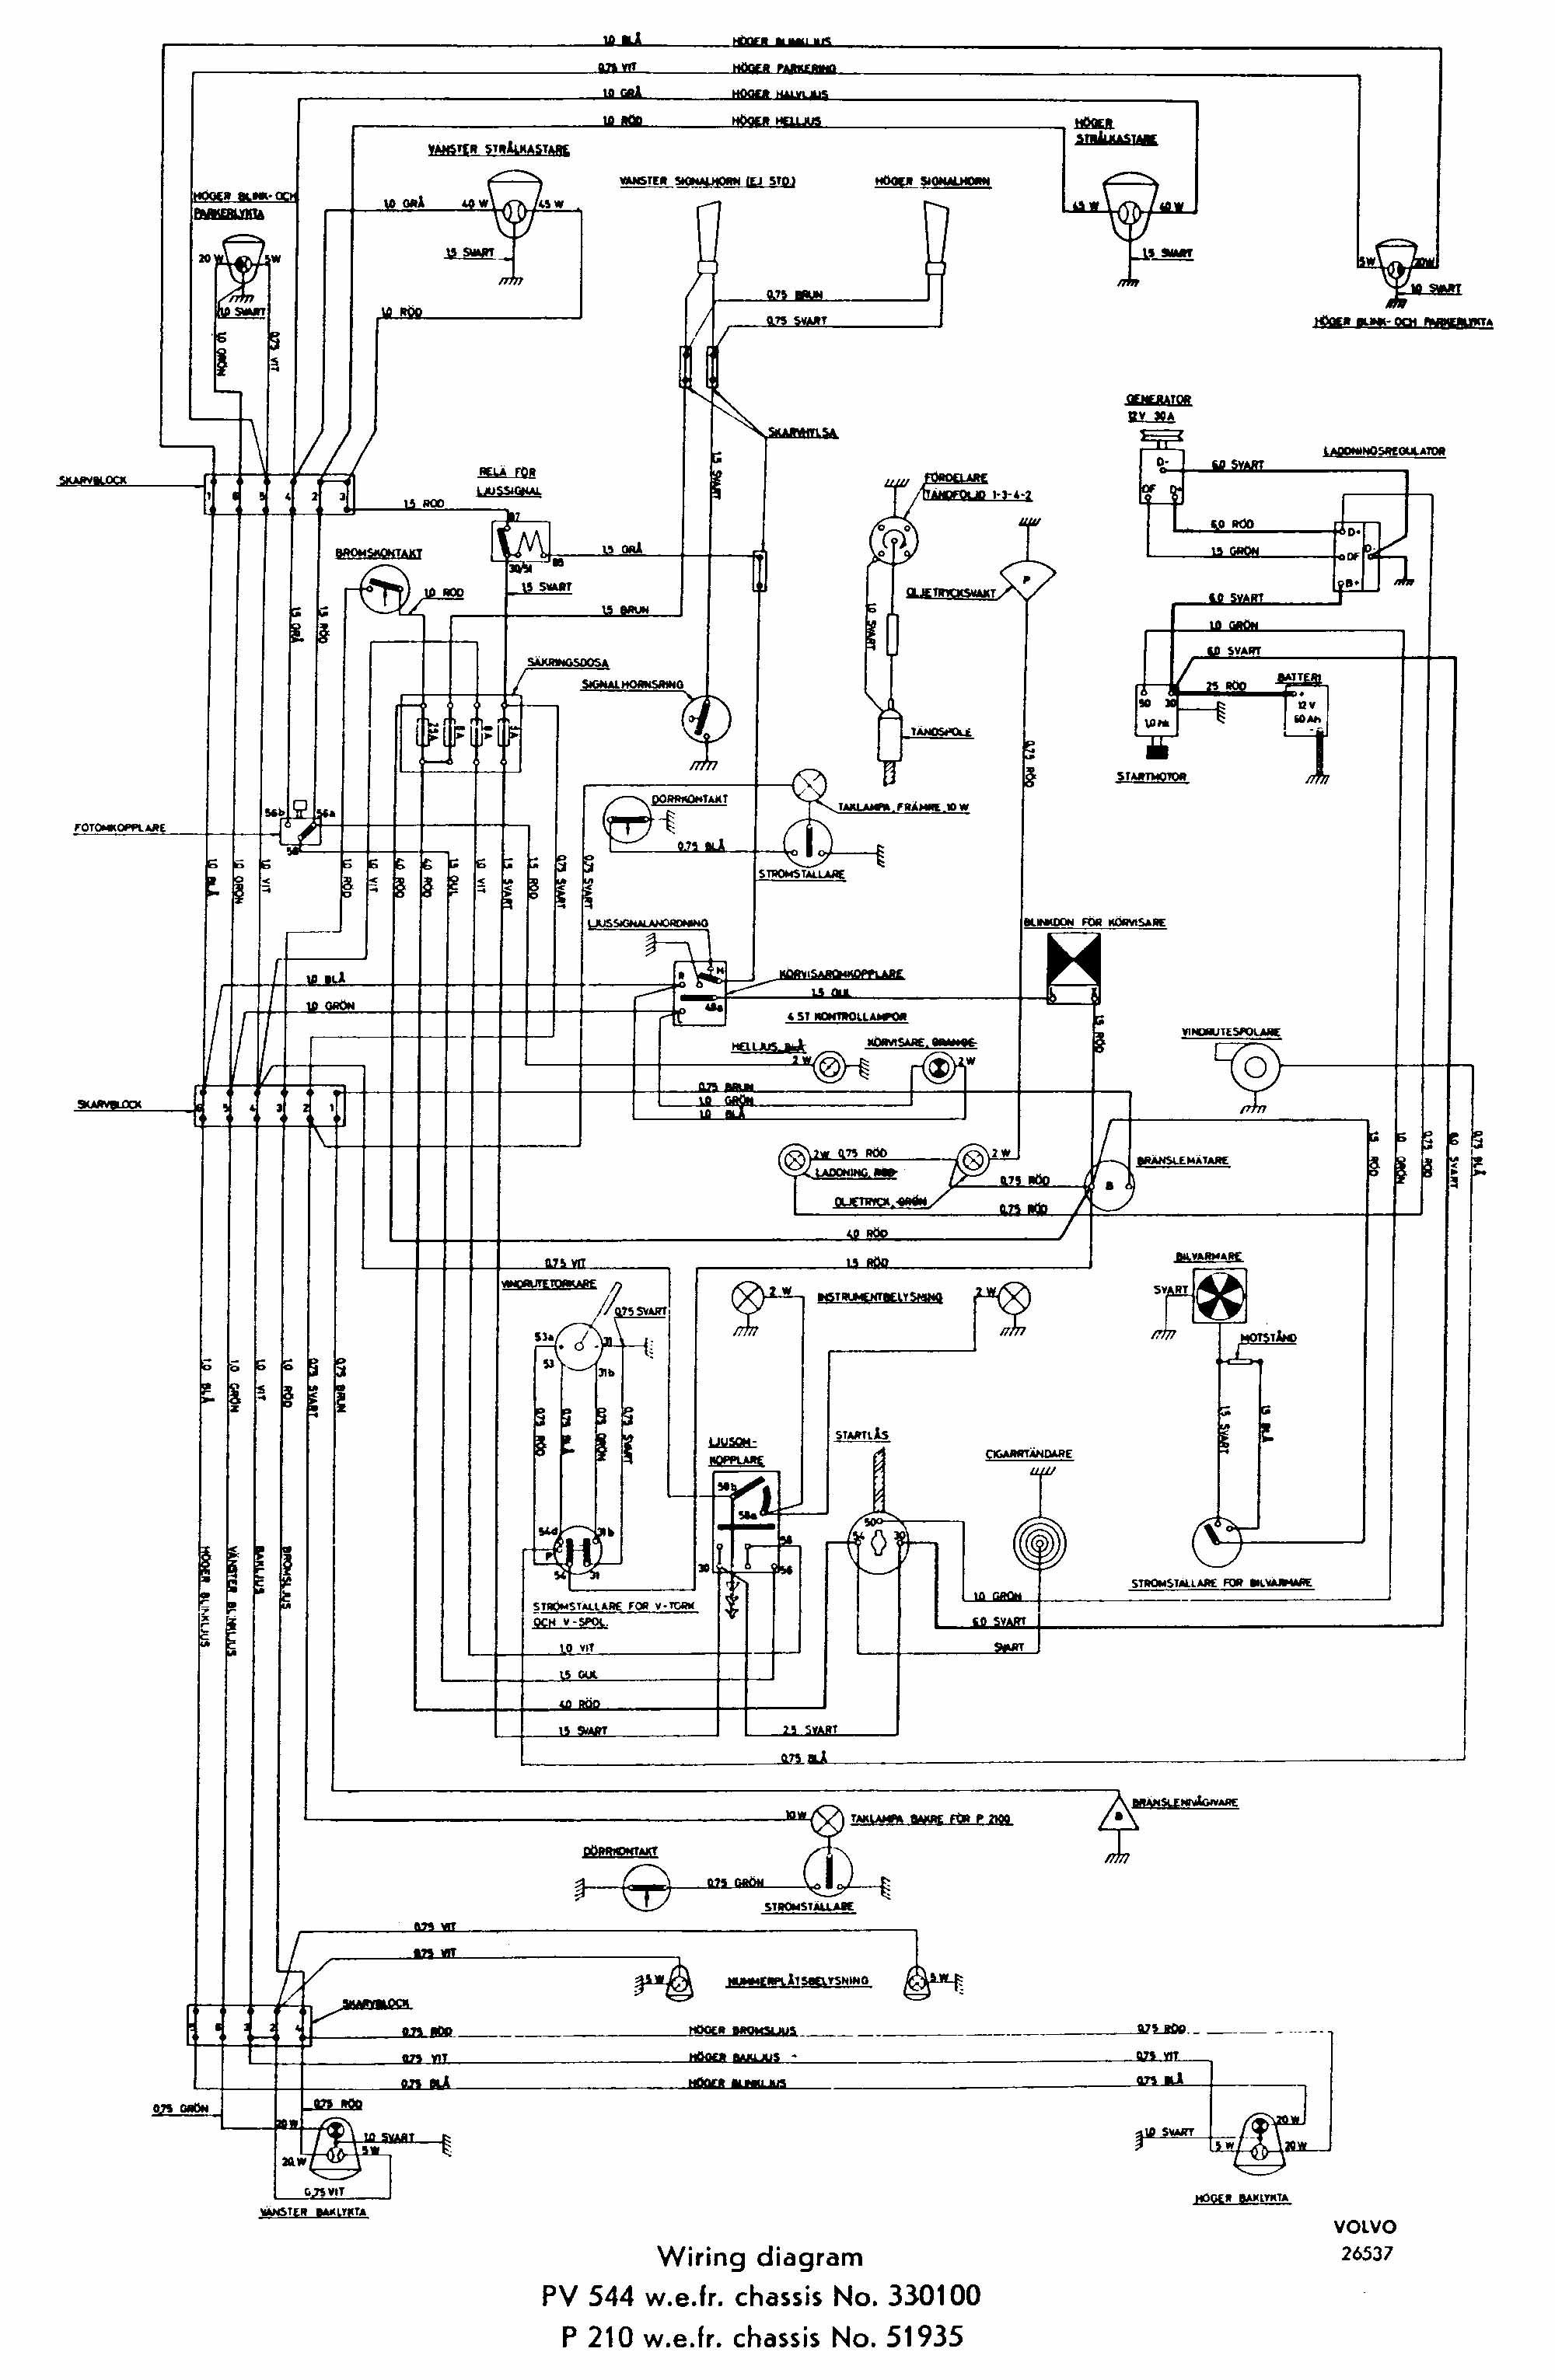 2010 ford edge wiring diagram